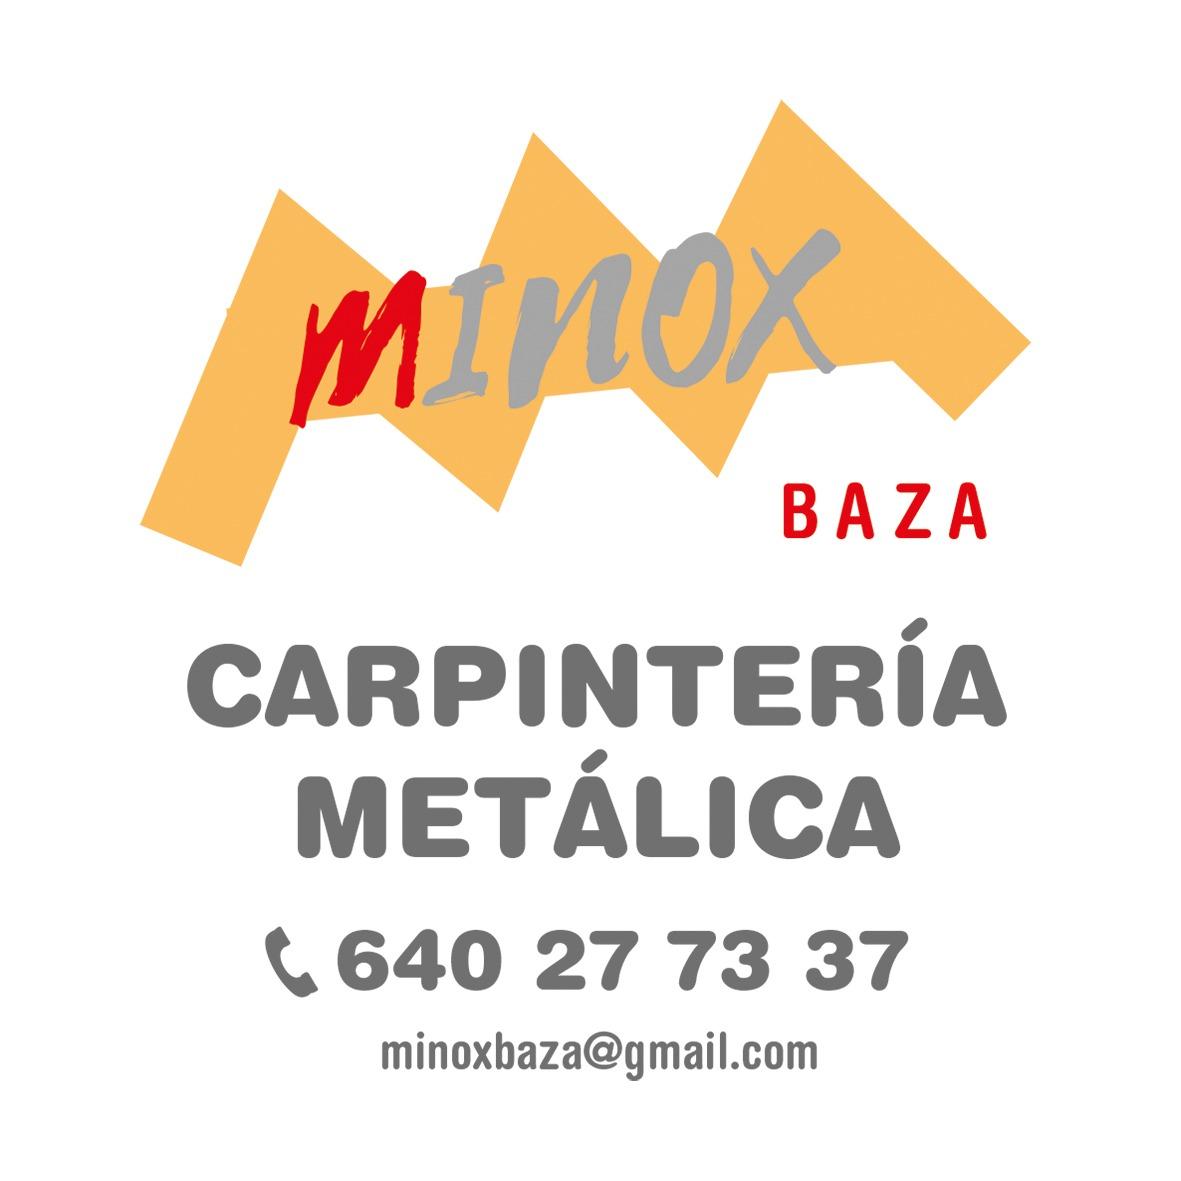 Minox Baza